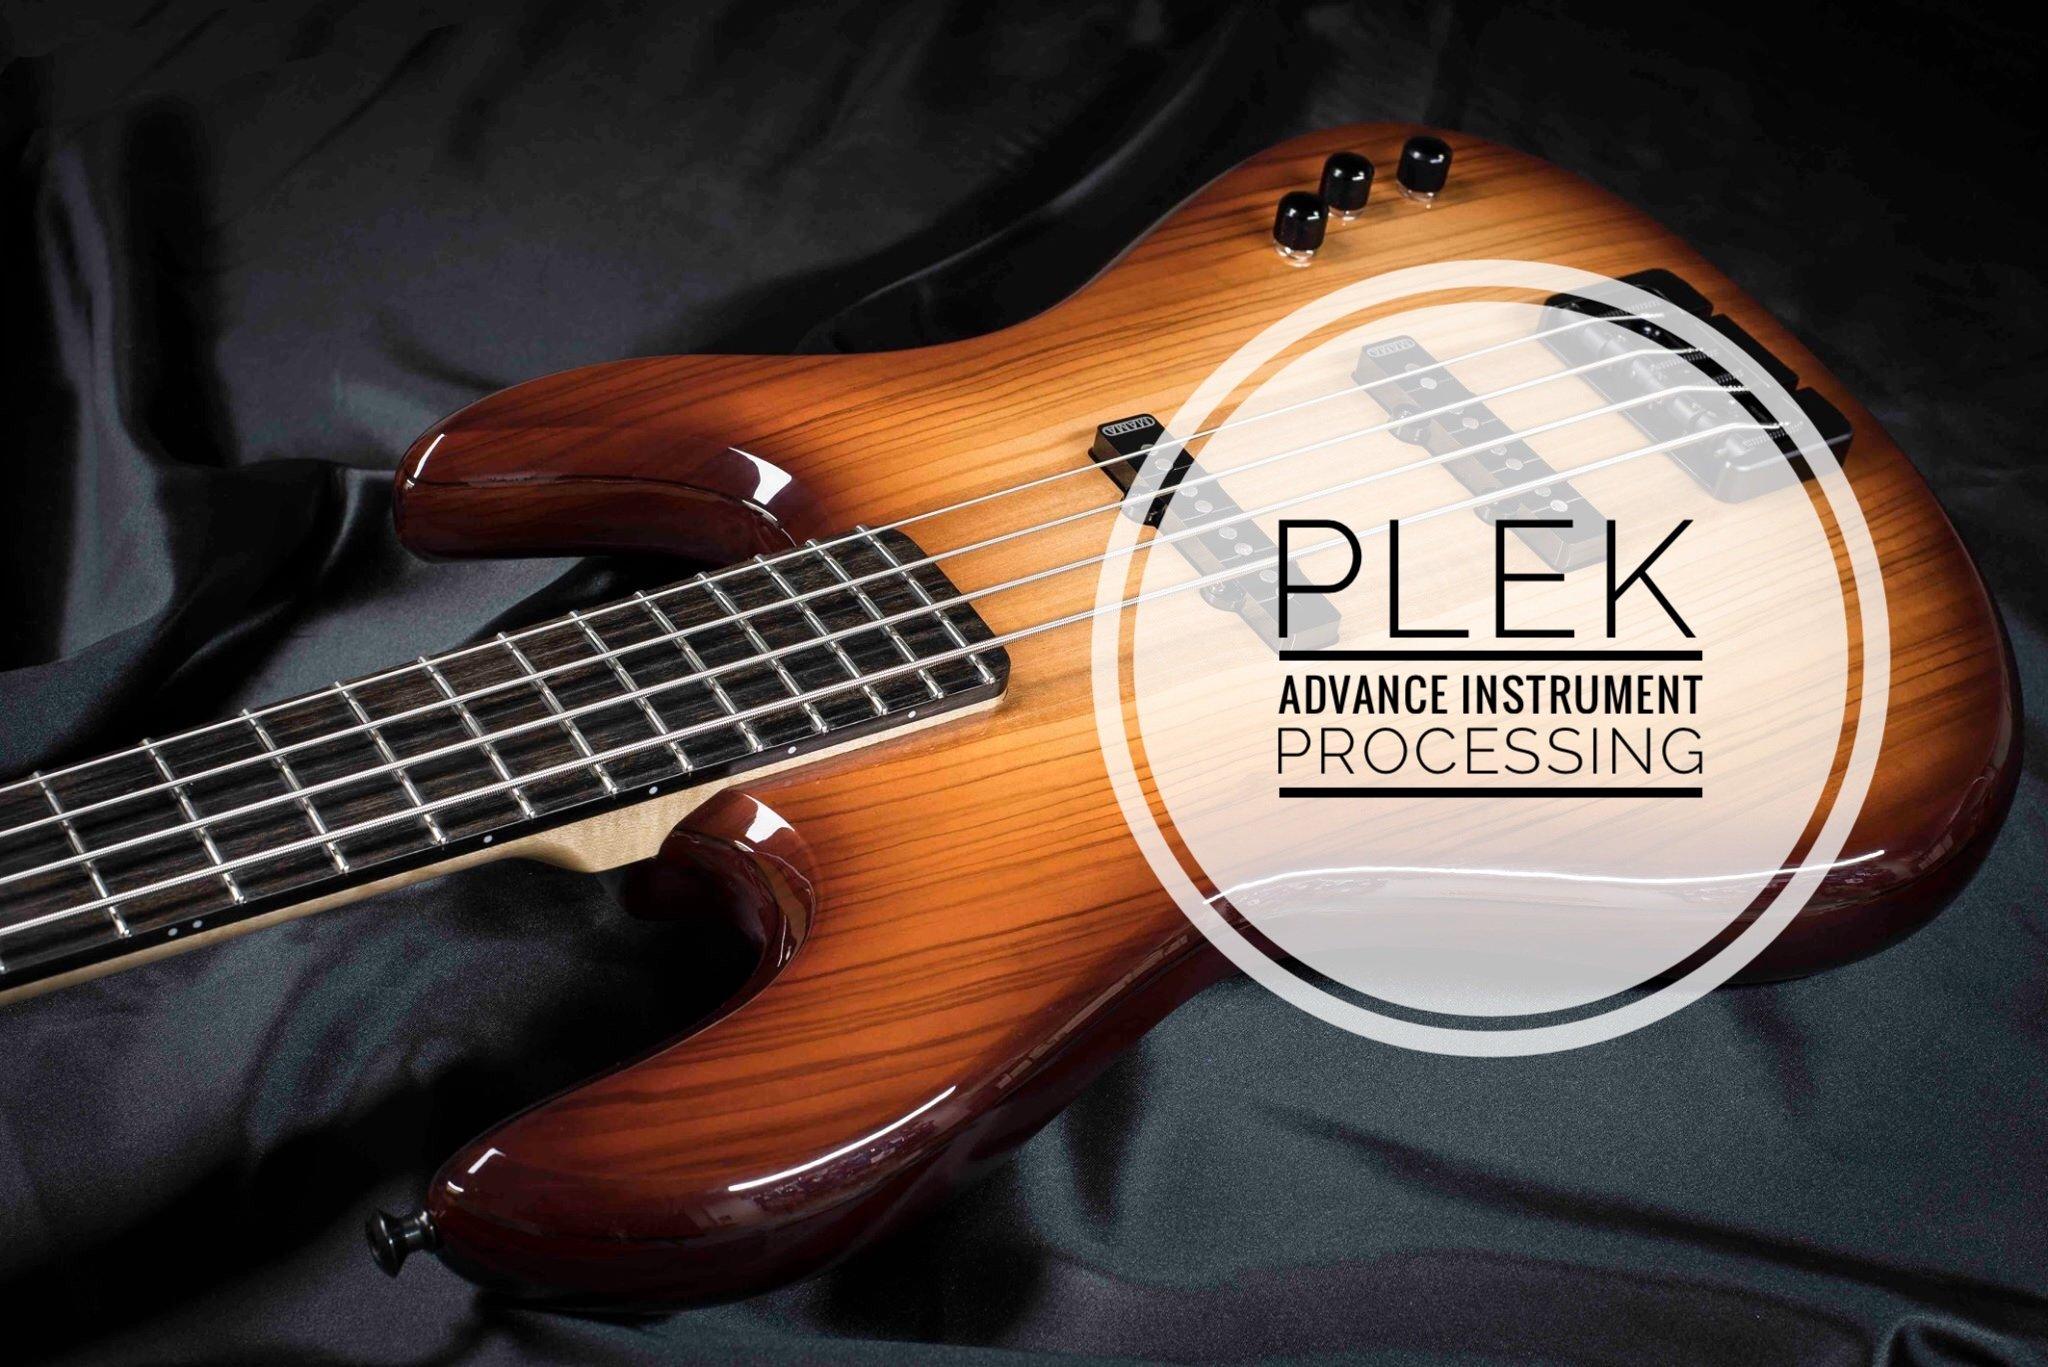 Perfect playability thanks to Plek!